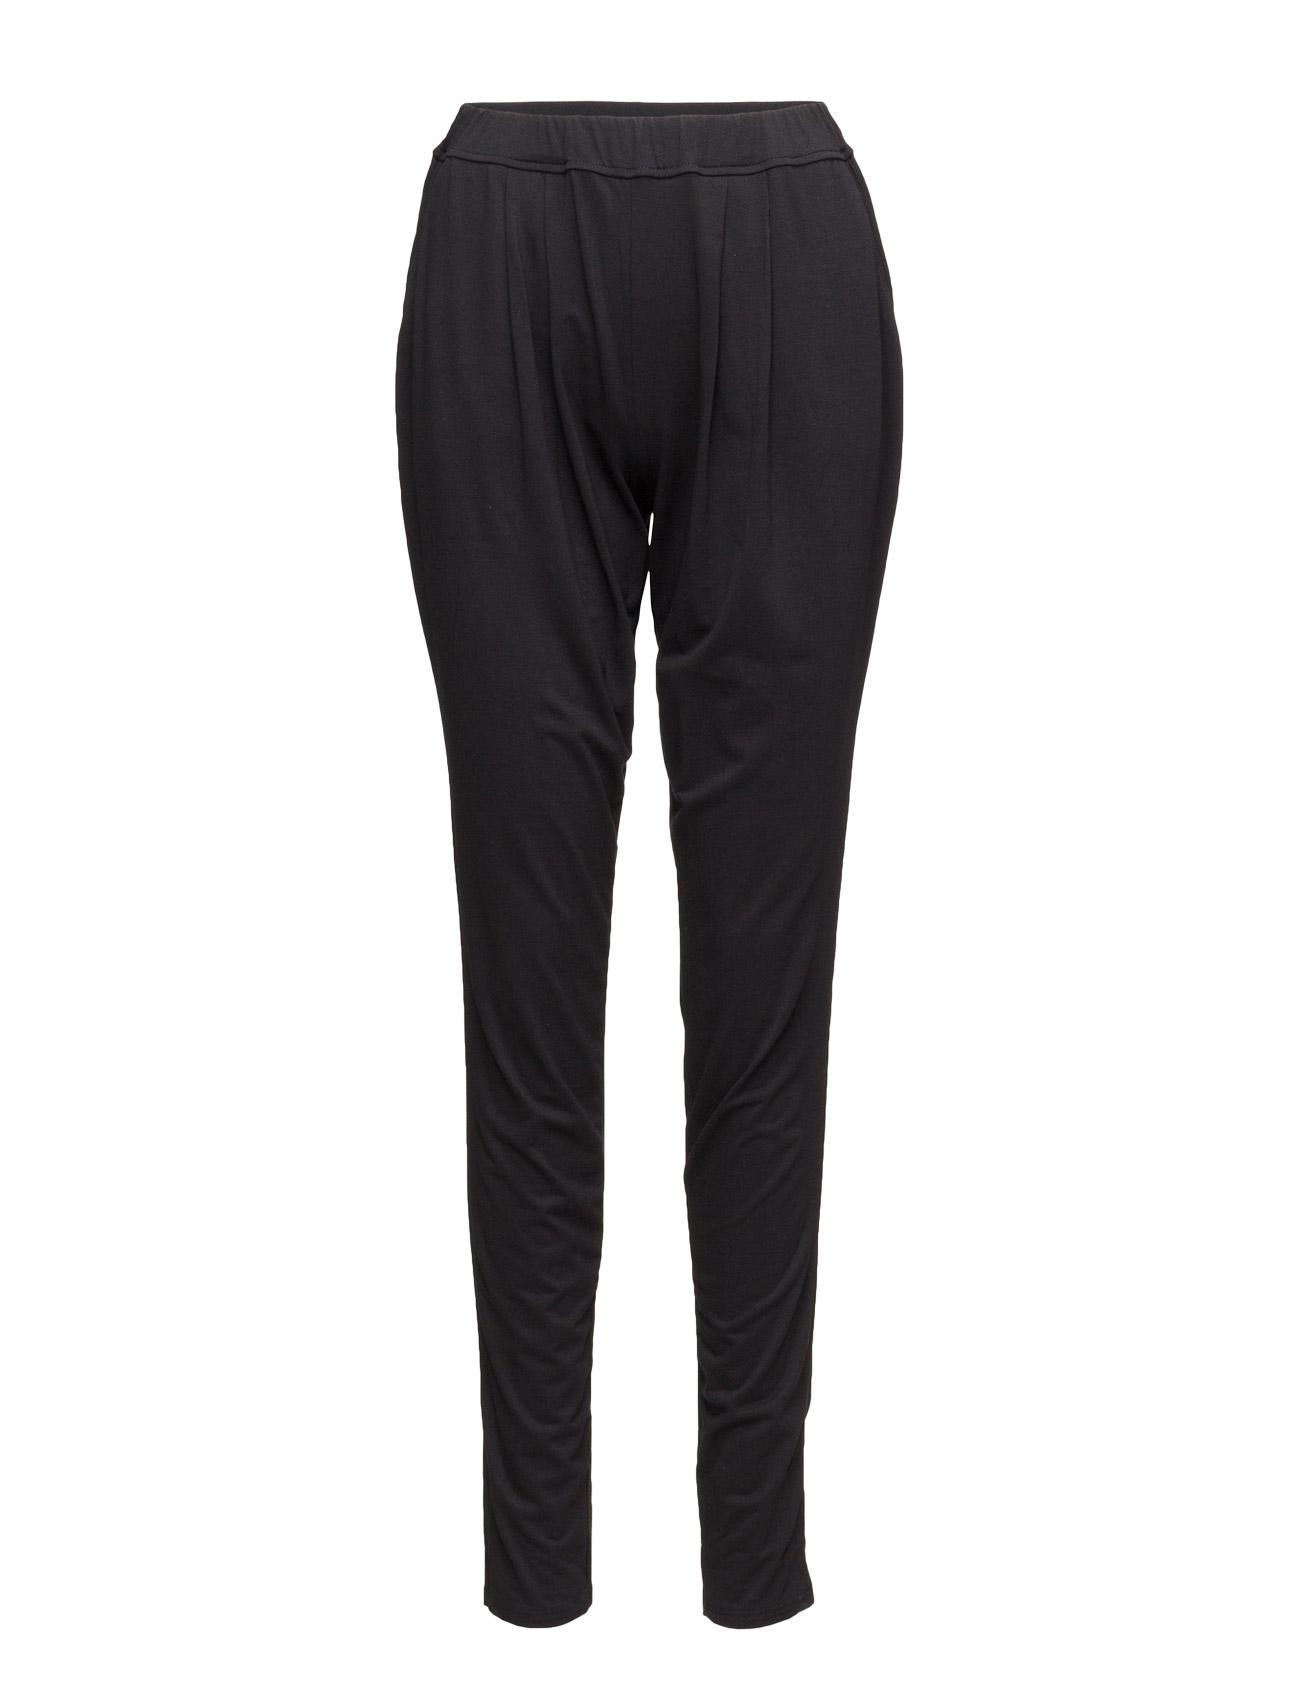 Ladies Trousers, Voyage Nanso Casual bukser til Damer i Sort